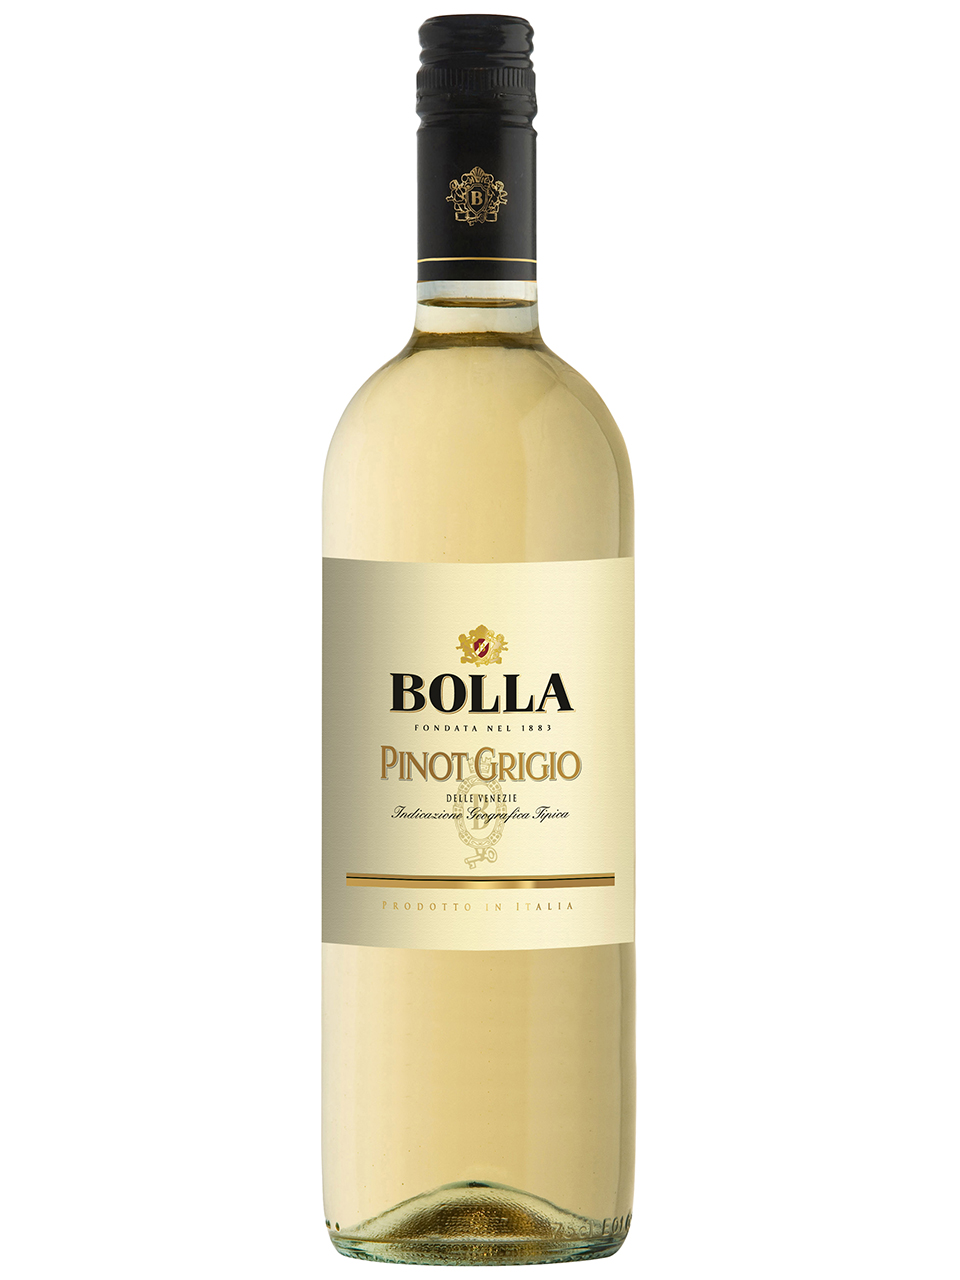 Bolla Pinot Grigio Delle Venezie IGT